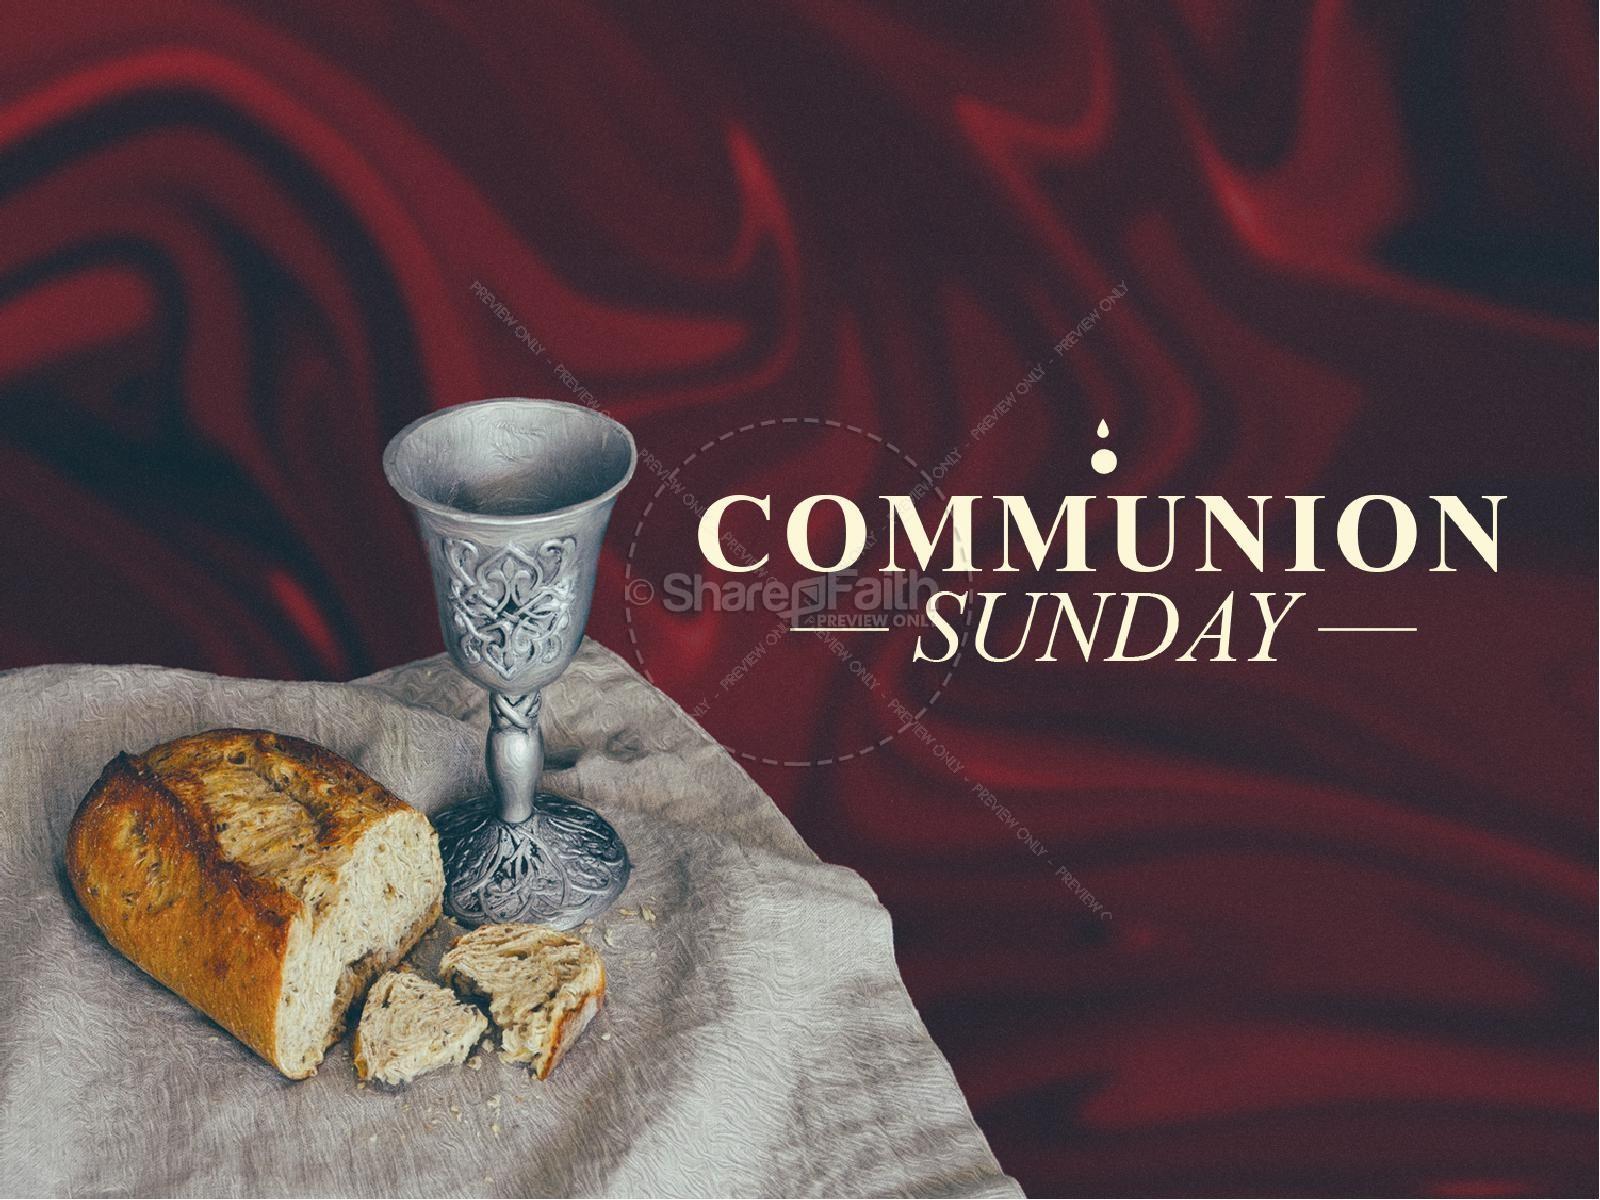 Communion Sunday Service Title Graphic | slide 1